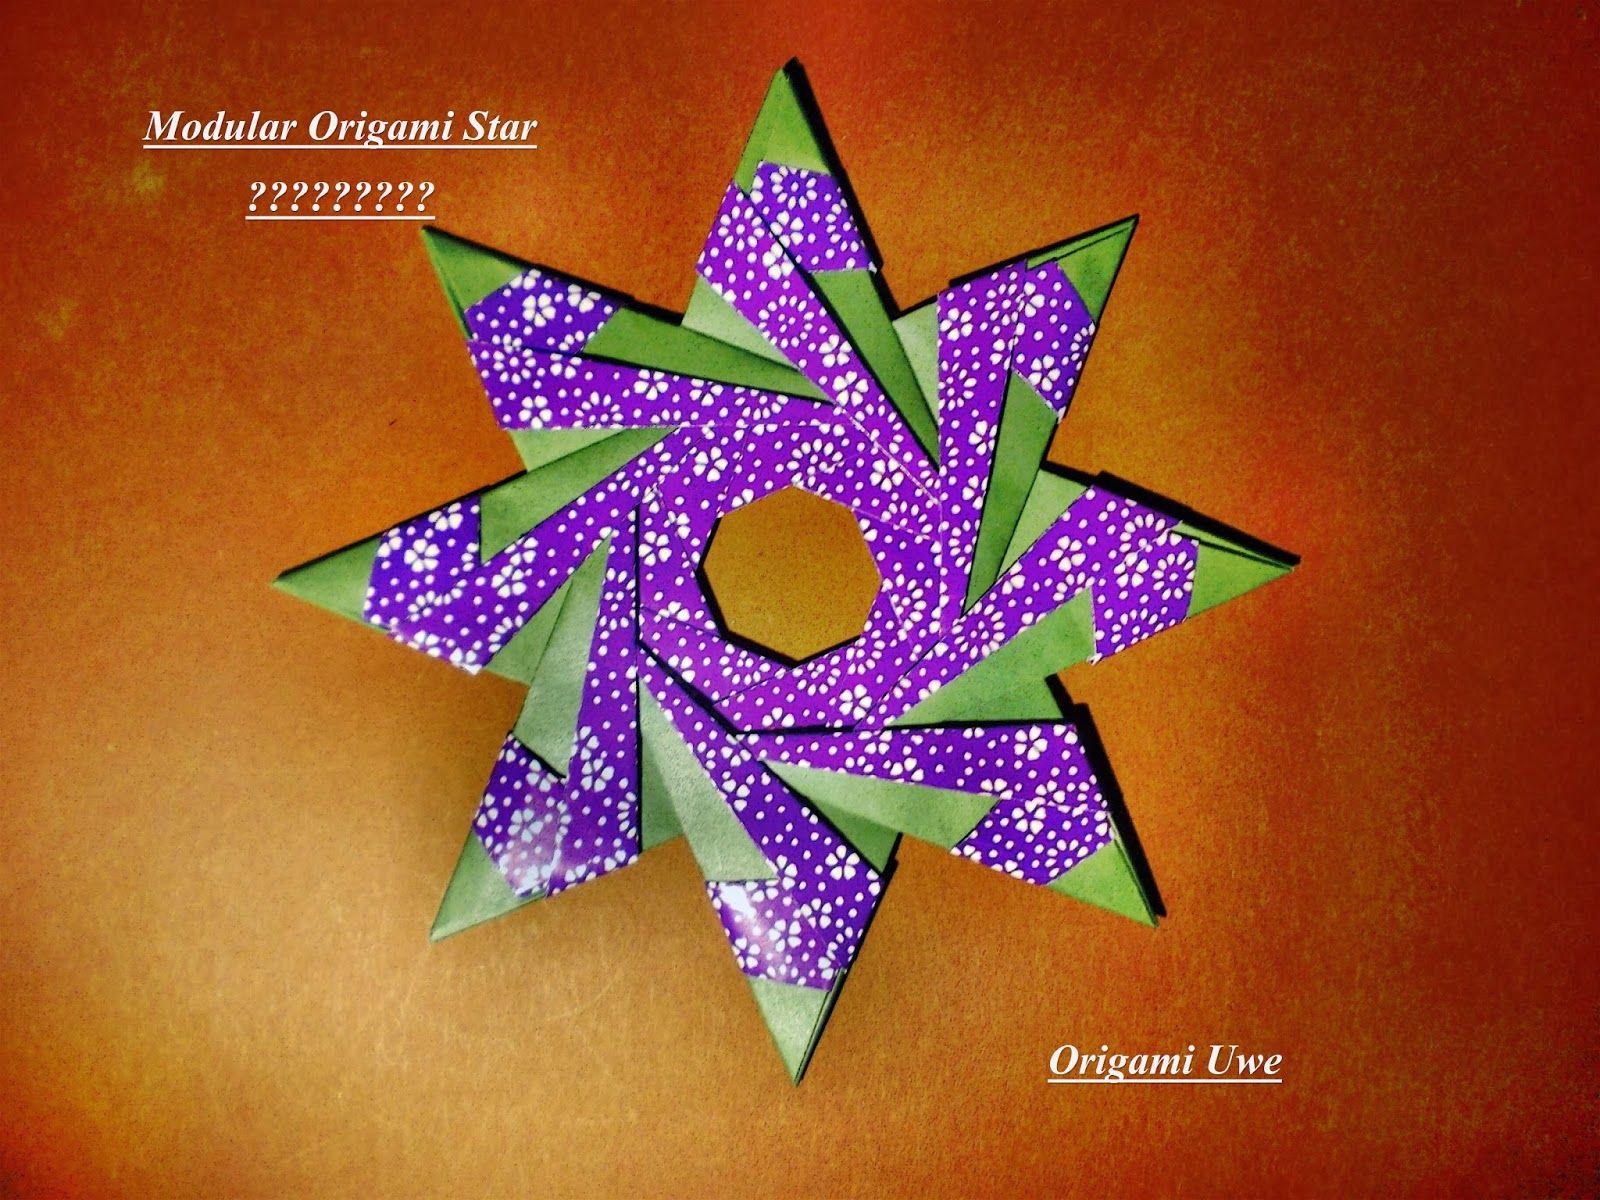 Modular Origami Star Design by me   Origami   Origami ... - photo#23